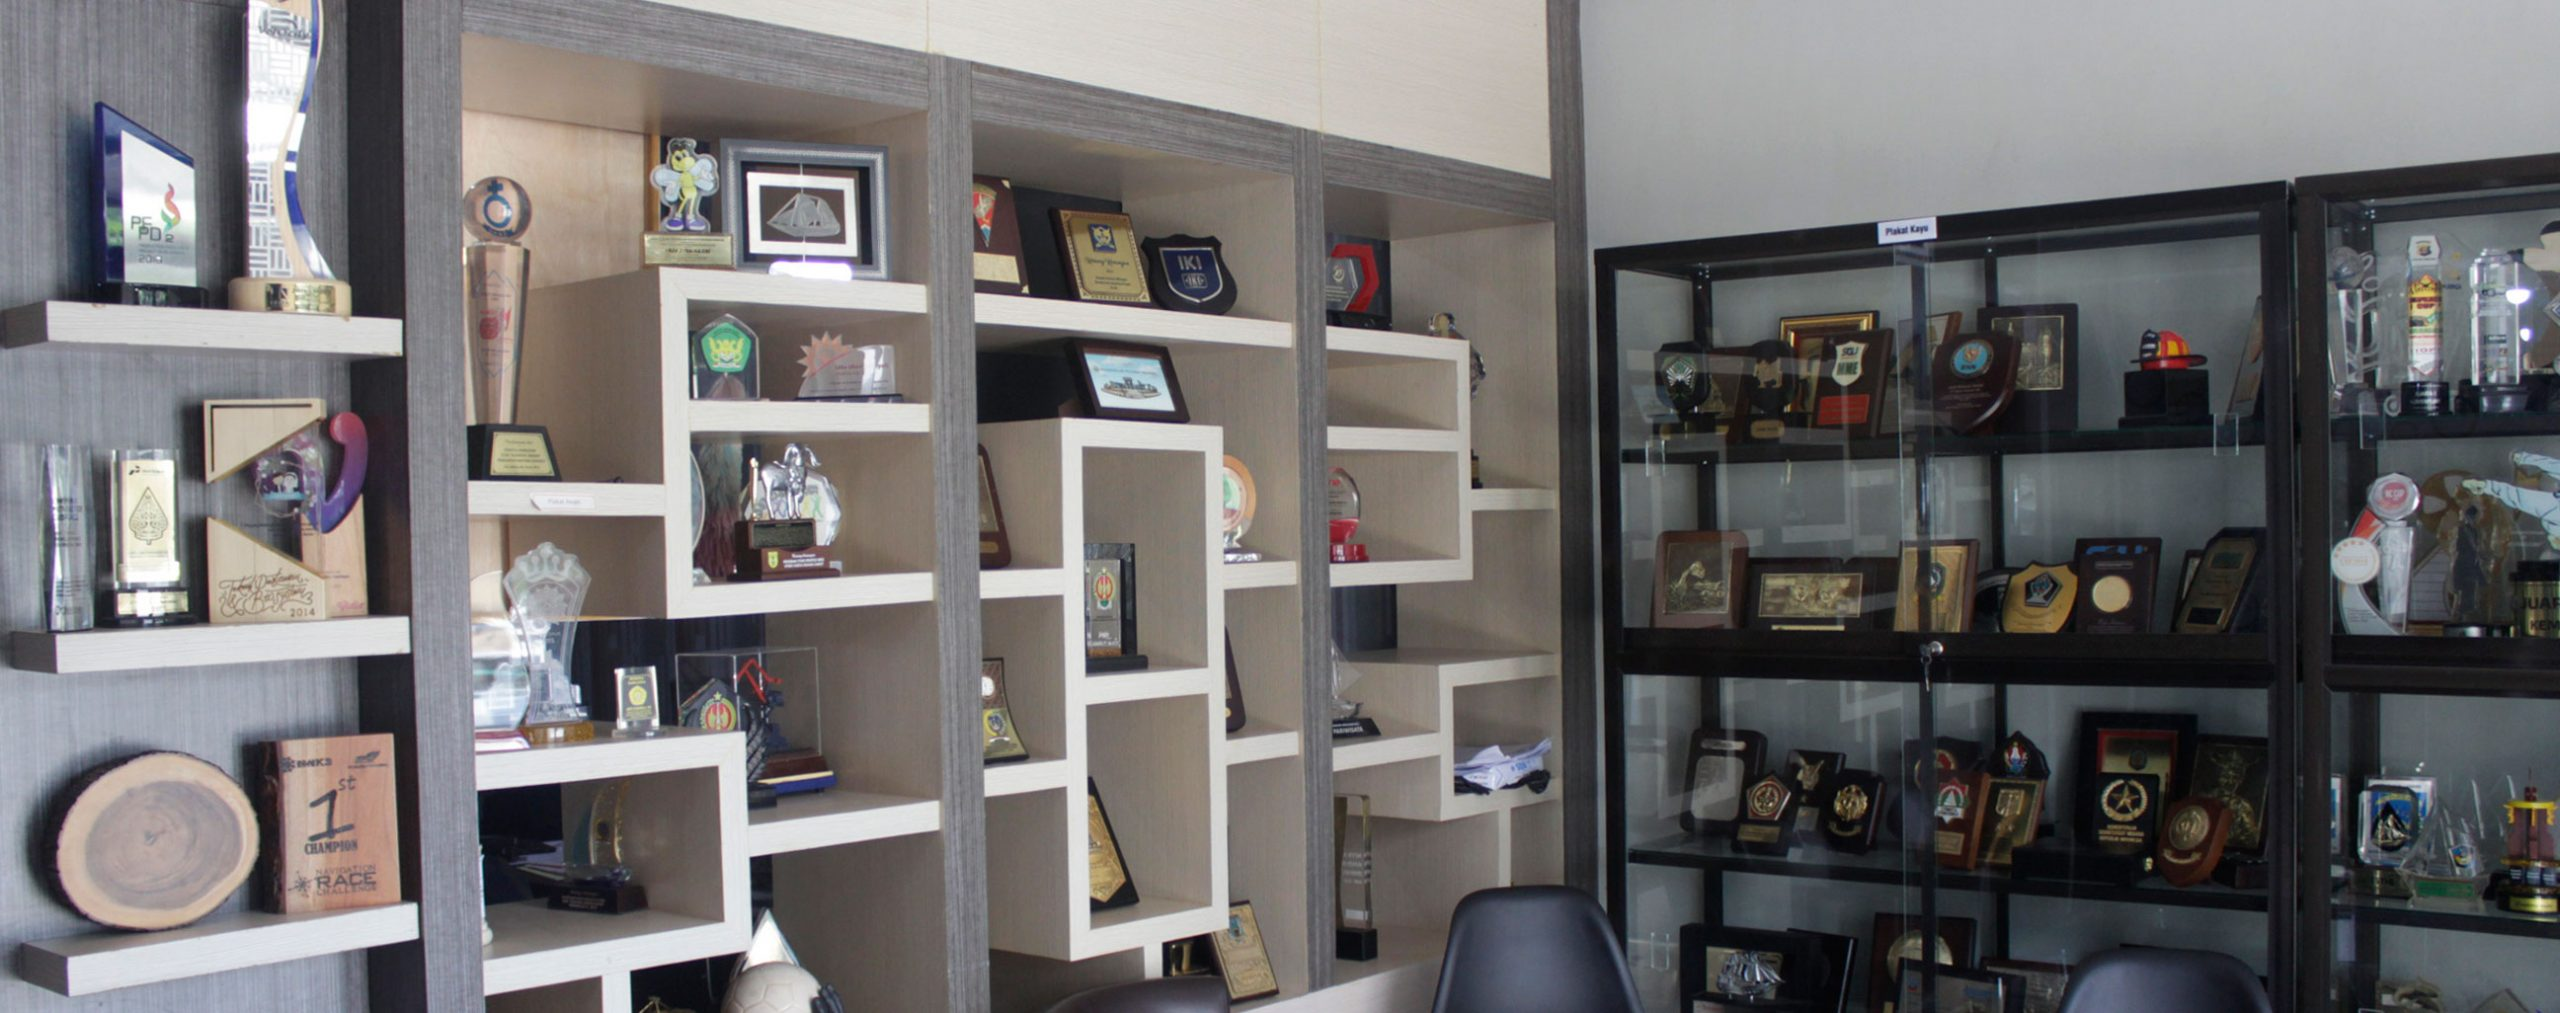 Tips merawat plakat, piala dan miniatur - display 1souvenir